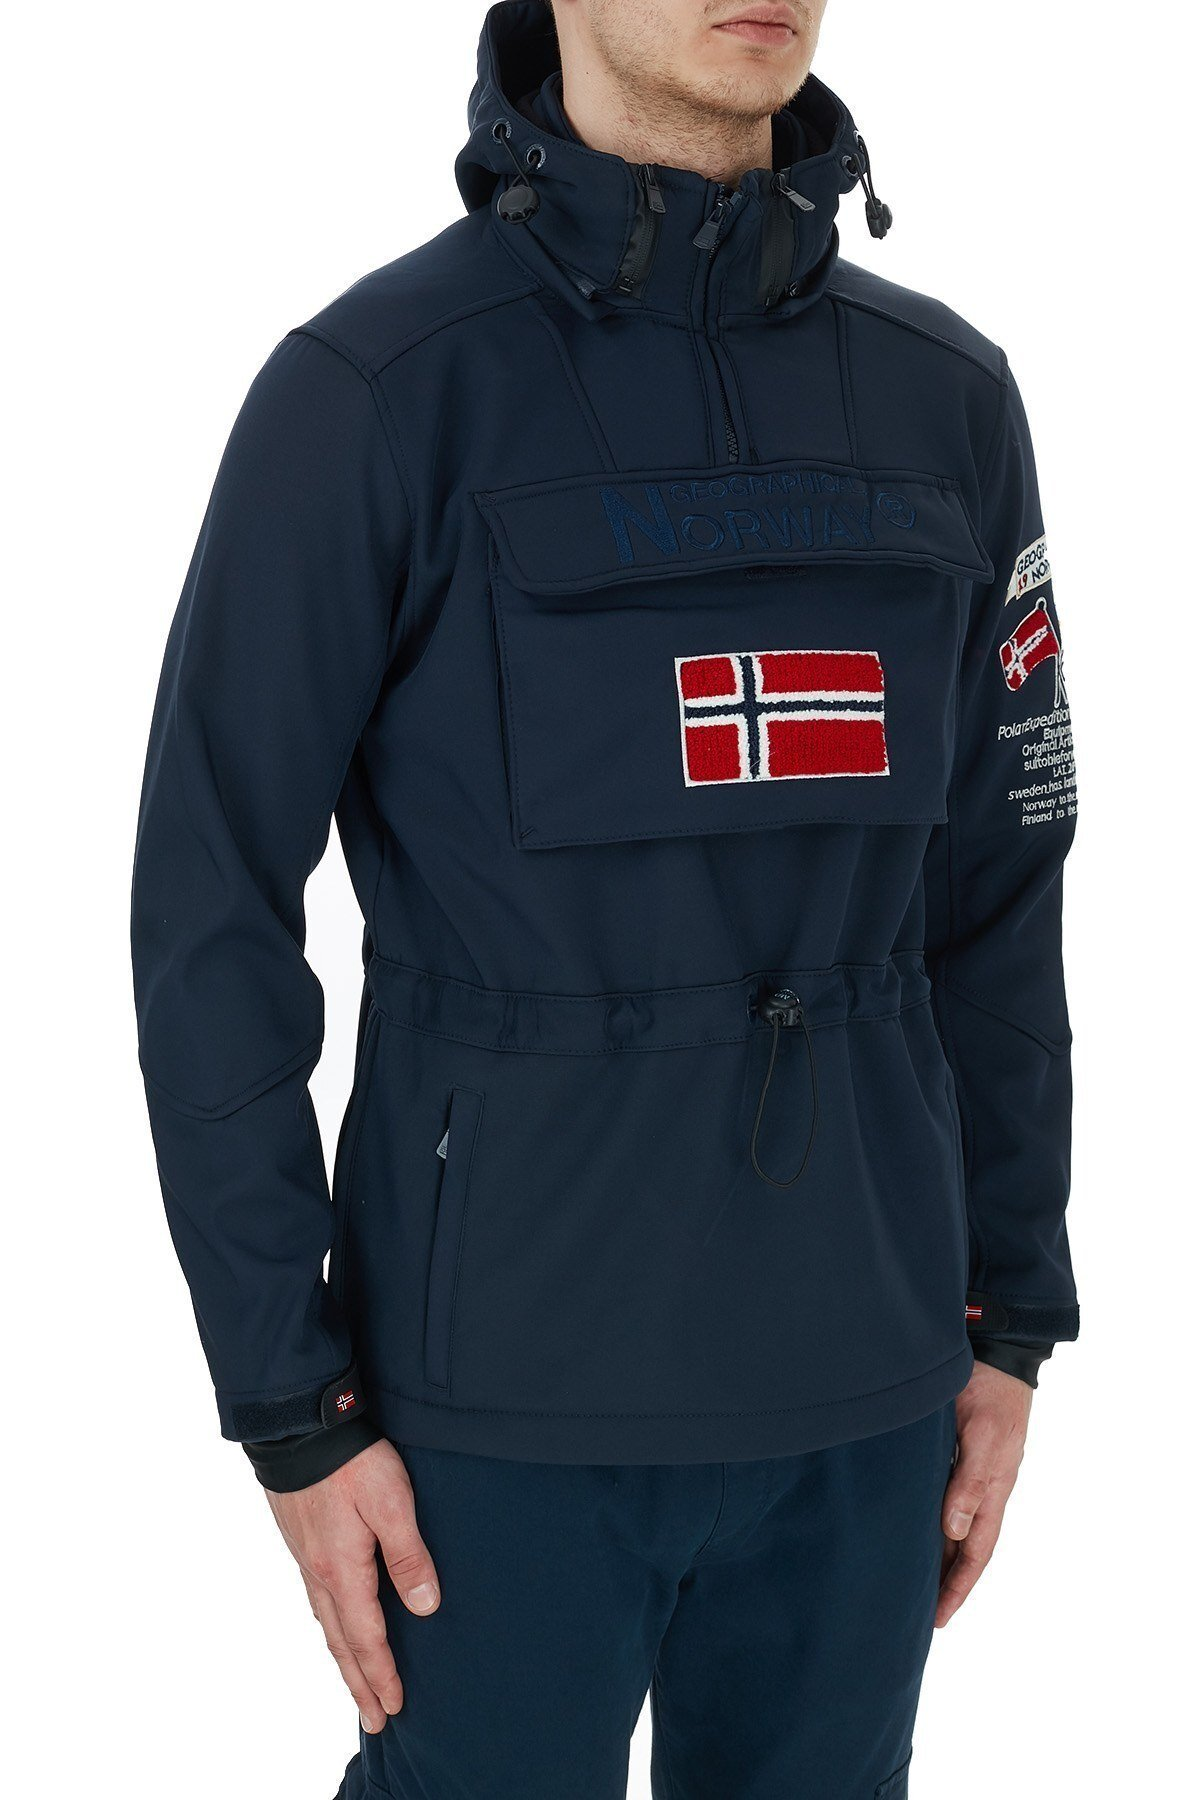 Norway Geographical Kapüşonlu Outdoor Erkek Mont TERREAUX LACİVERT